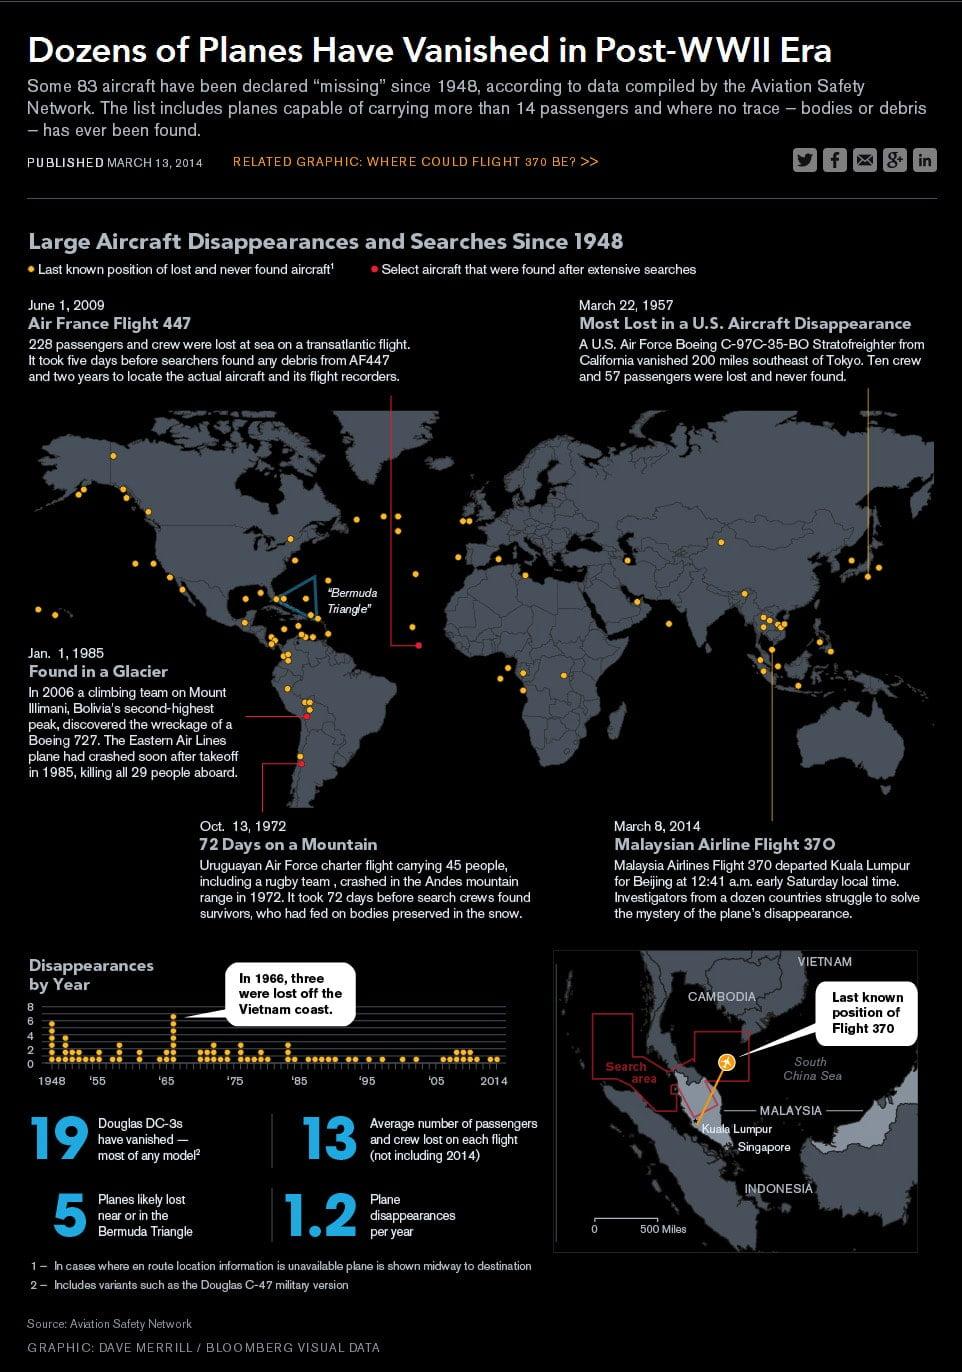 infographie-bloomberg-avions disparus-large